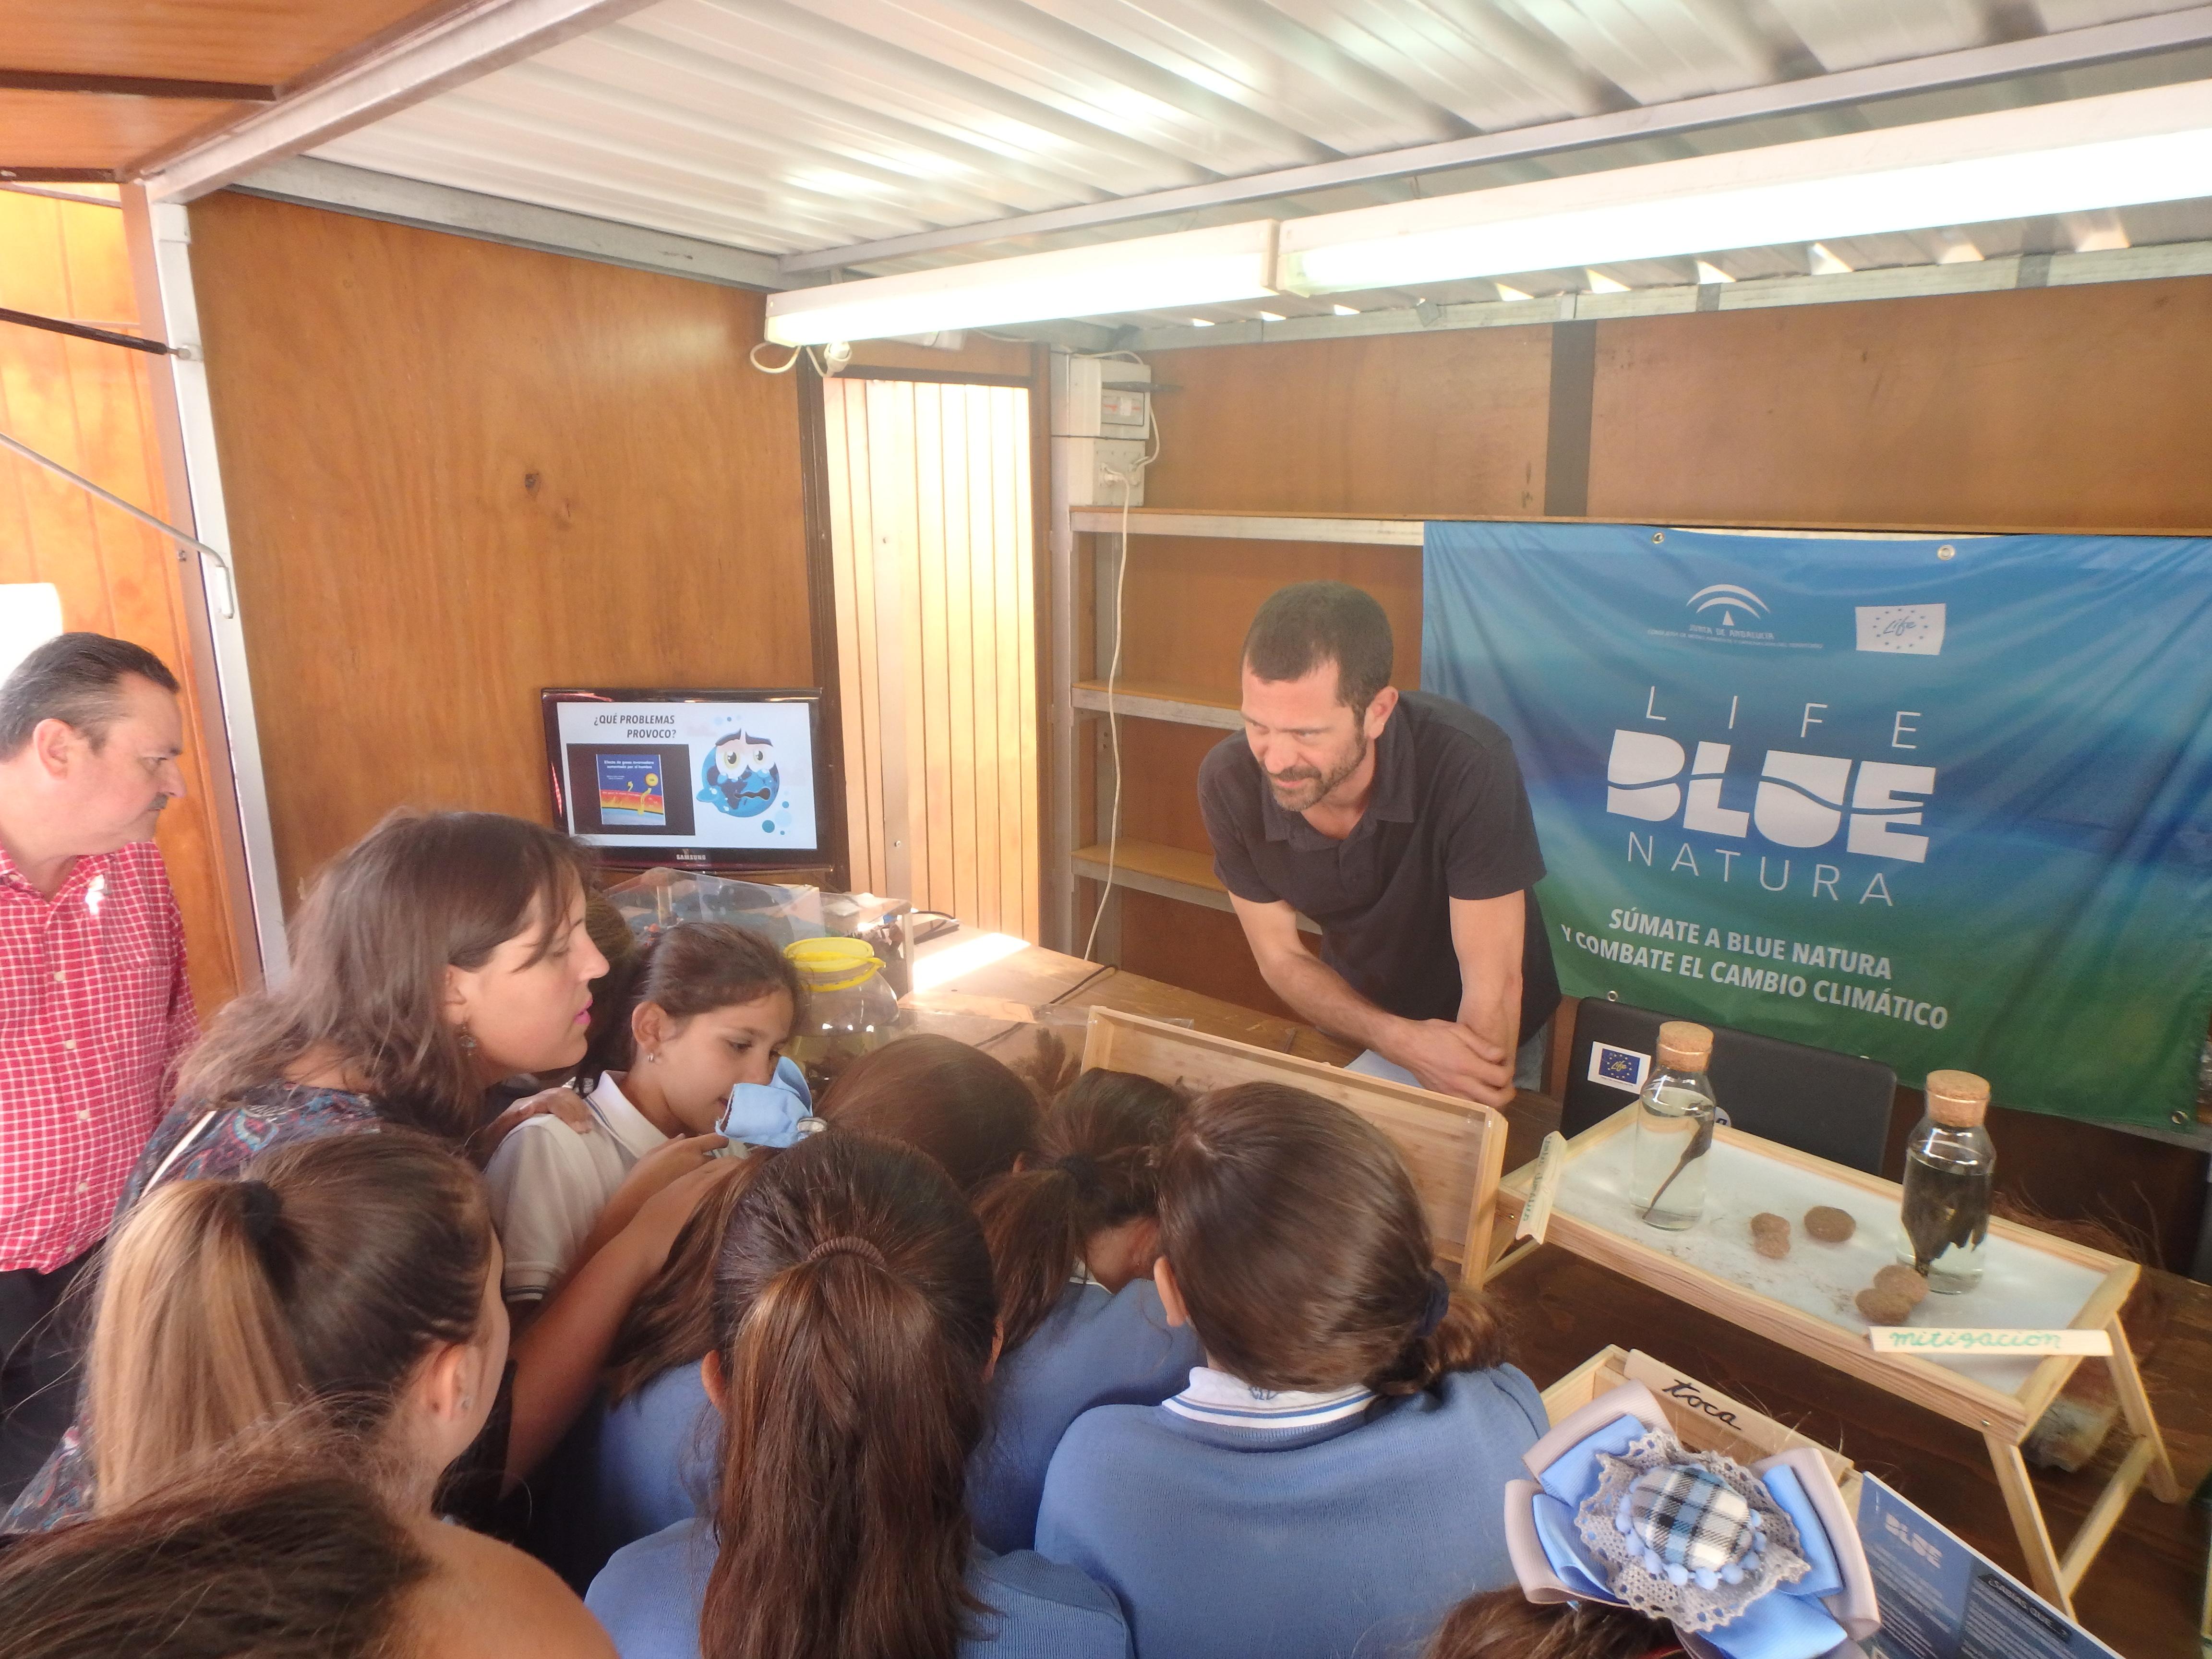 life Blue Natura Hits Algecira in 2019